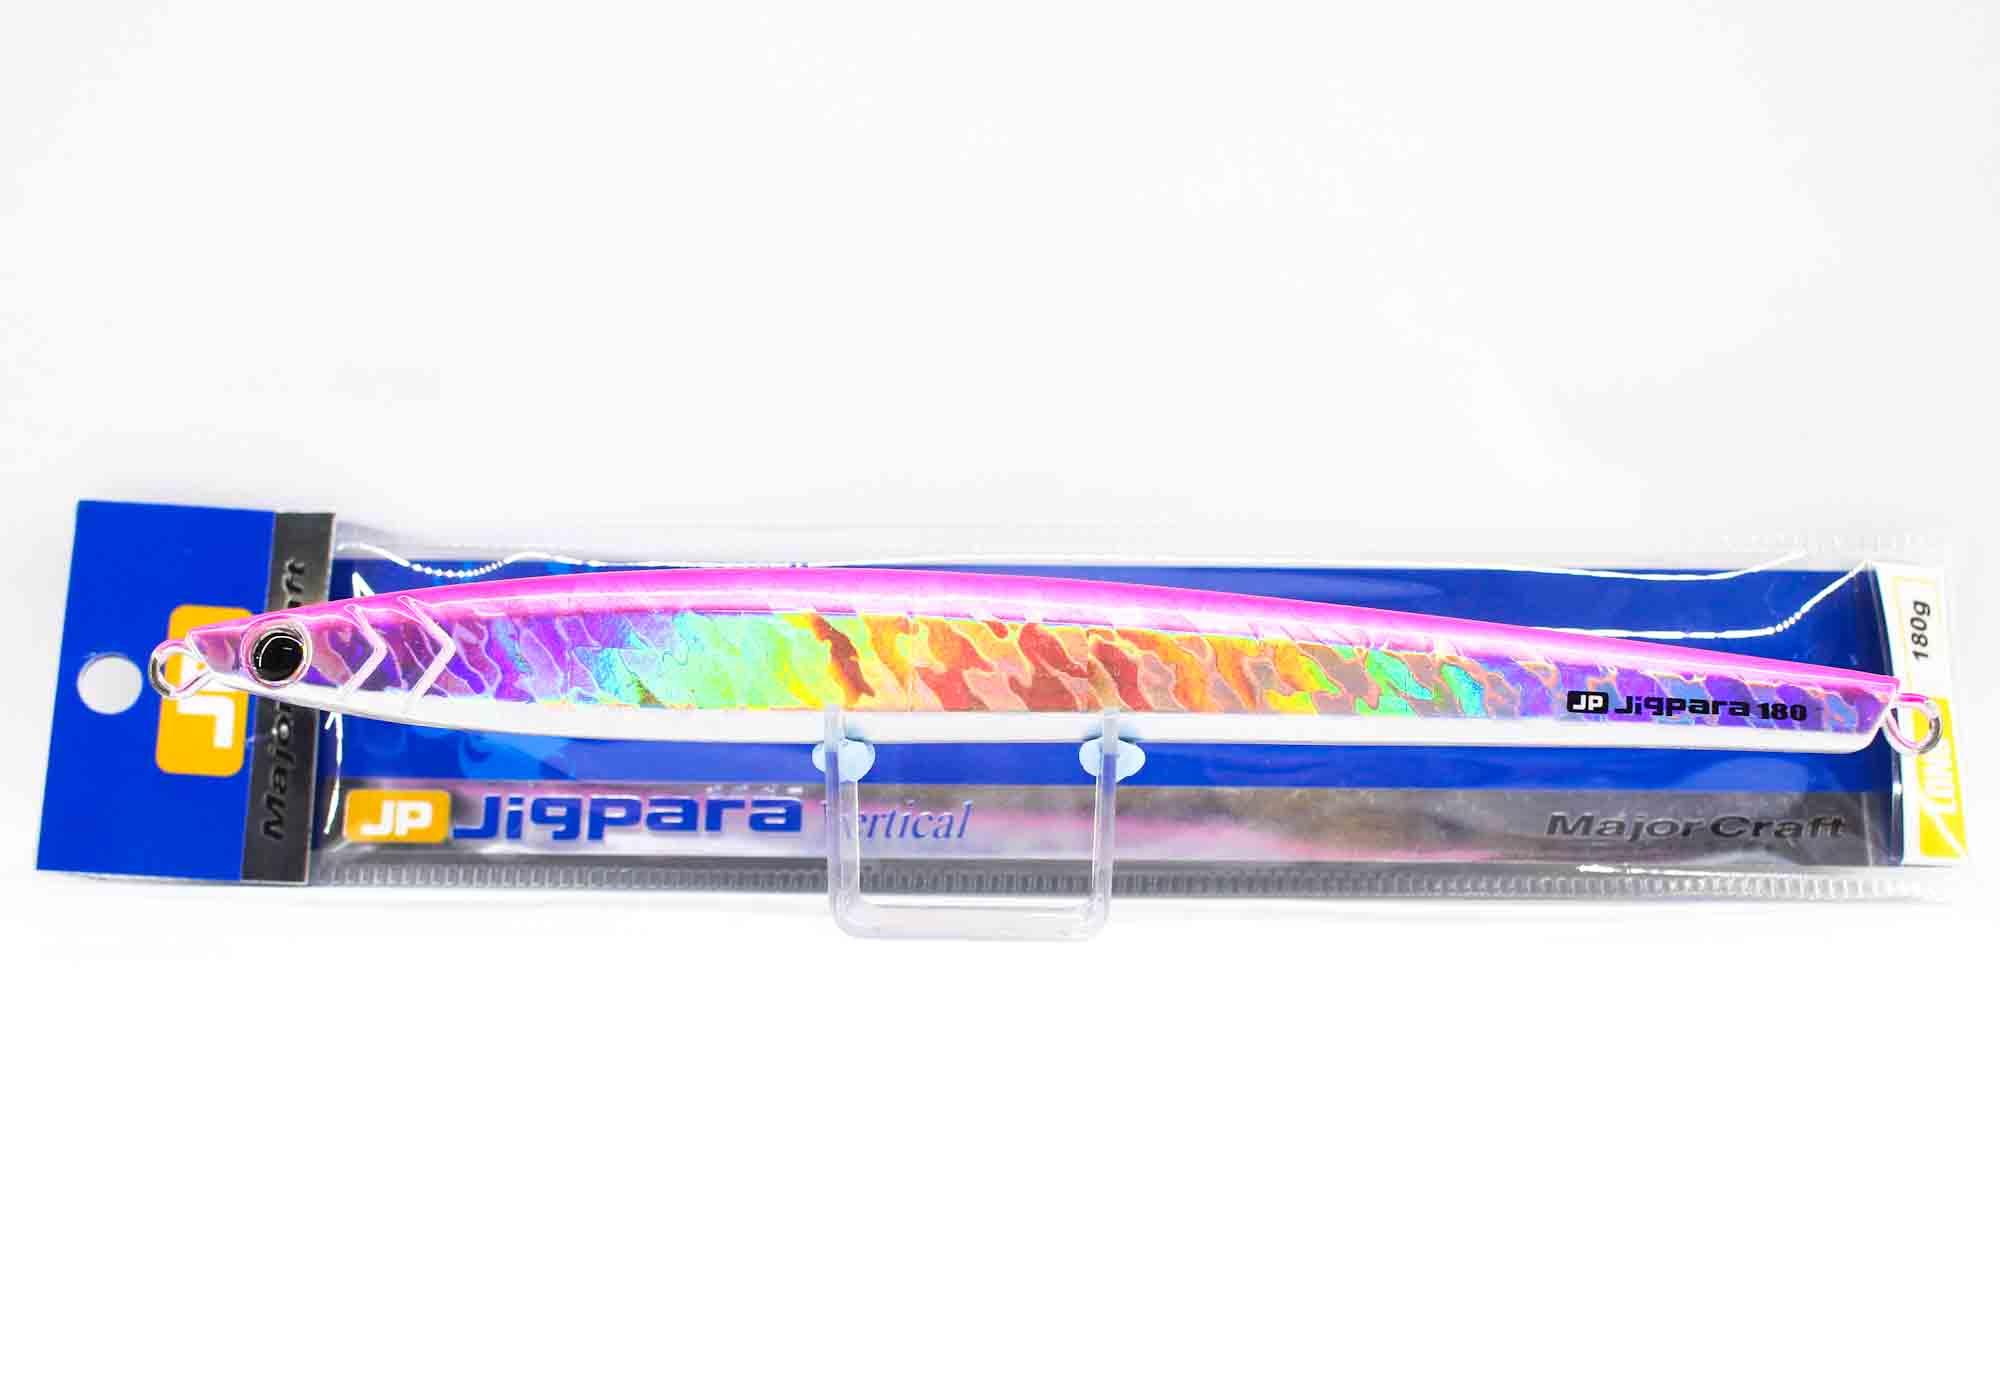 Major Craft Metal Jig Jigpara Vertical JPVL-180 grams 002 (3381)